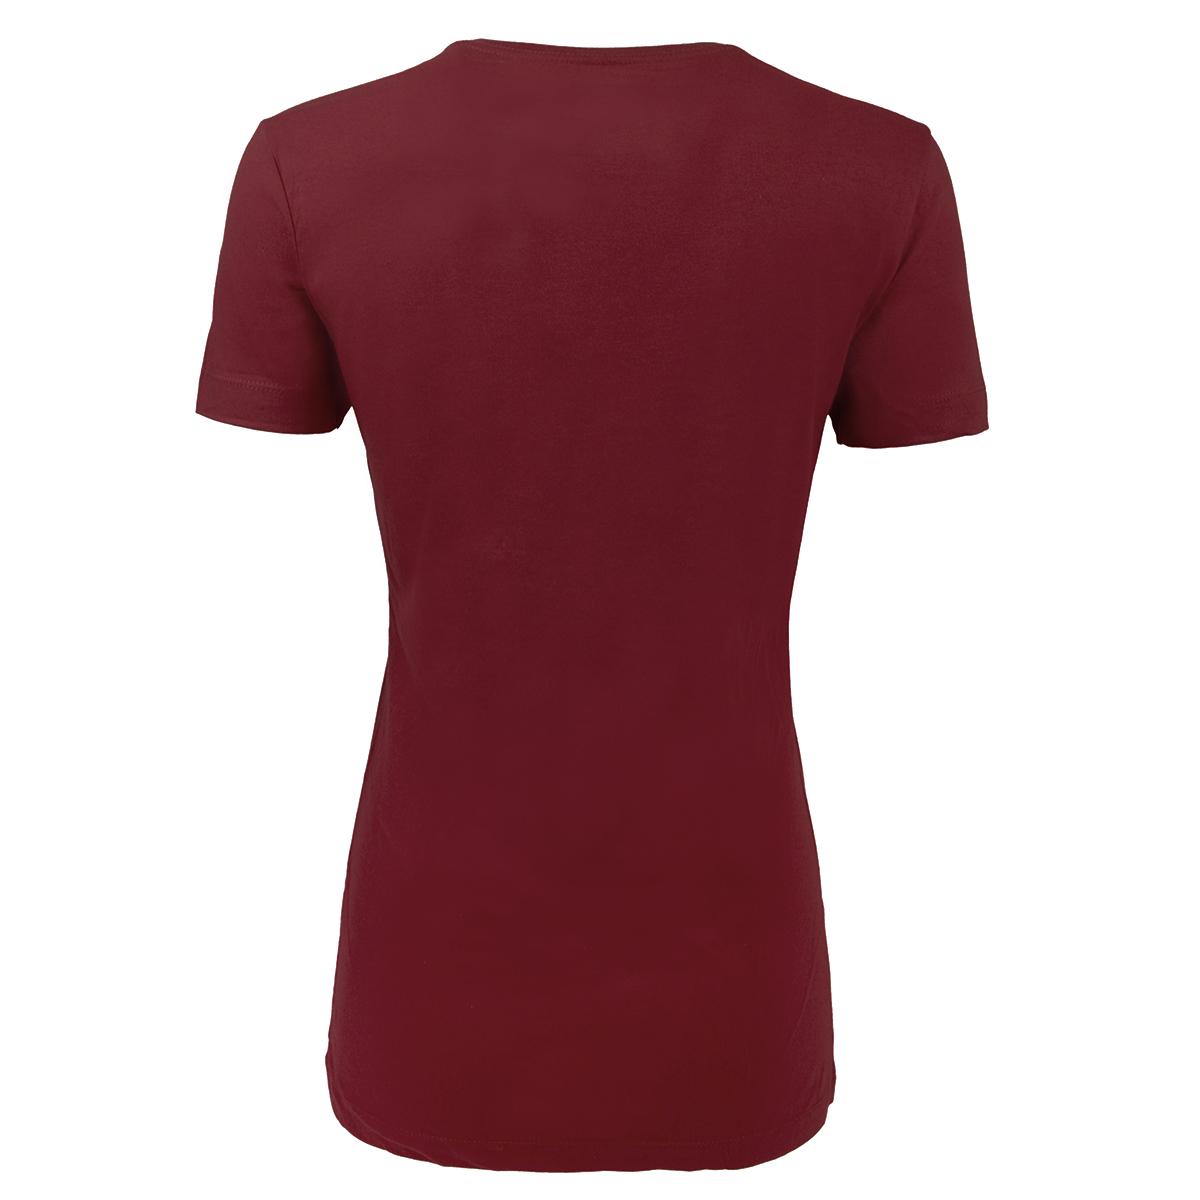 Nike-Women-039-s-Cotton-Slim-Fit-T-Shirt thumbnail 11